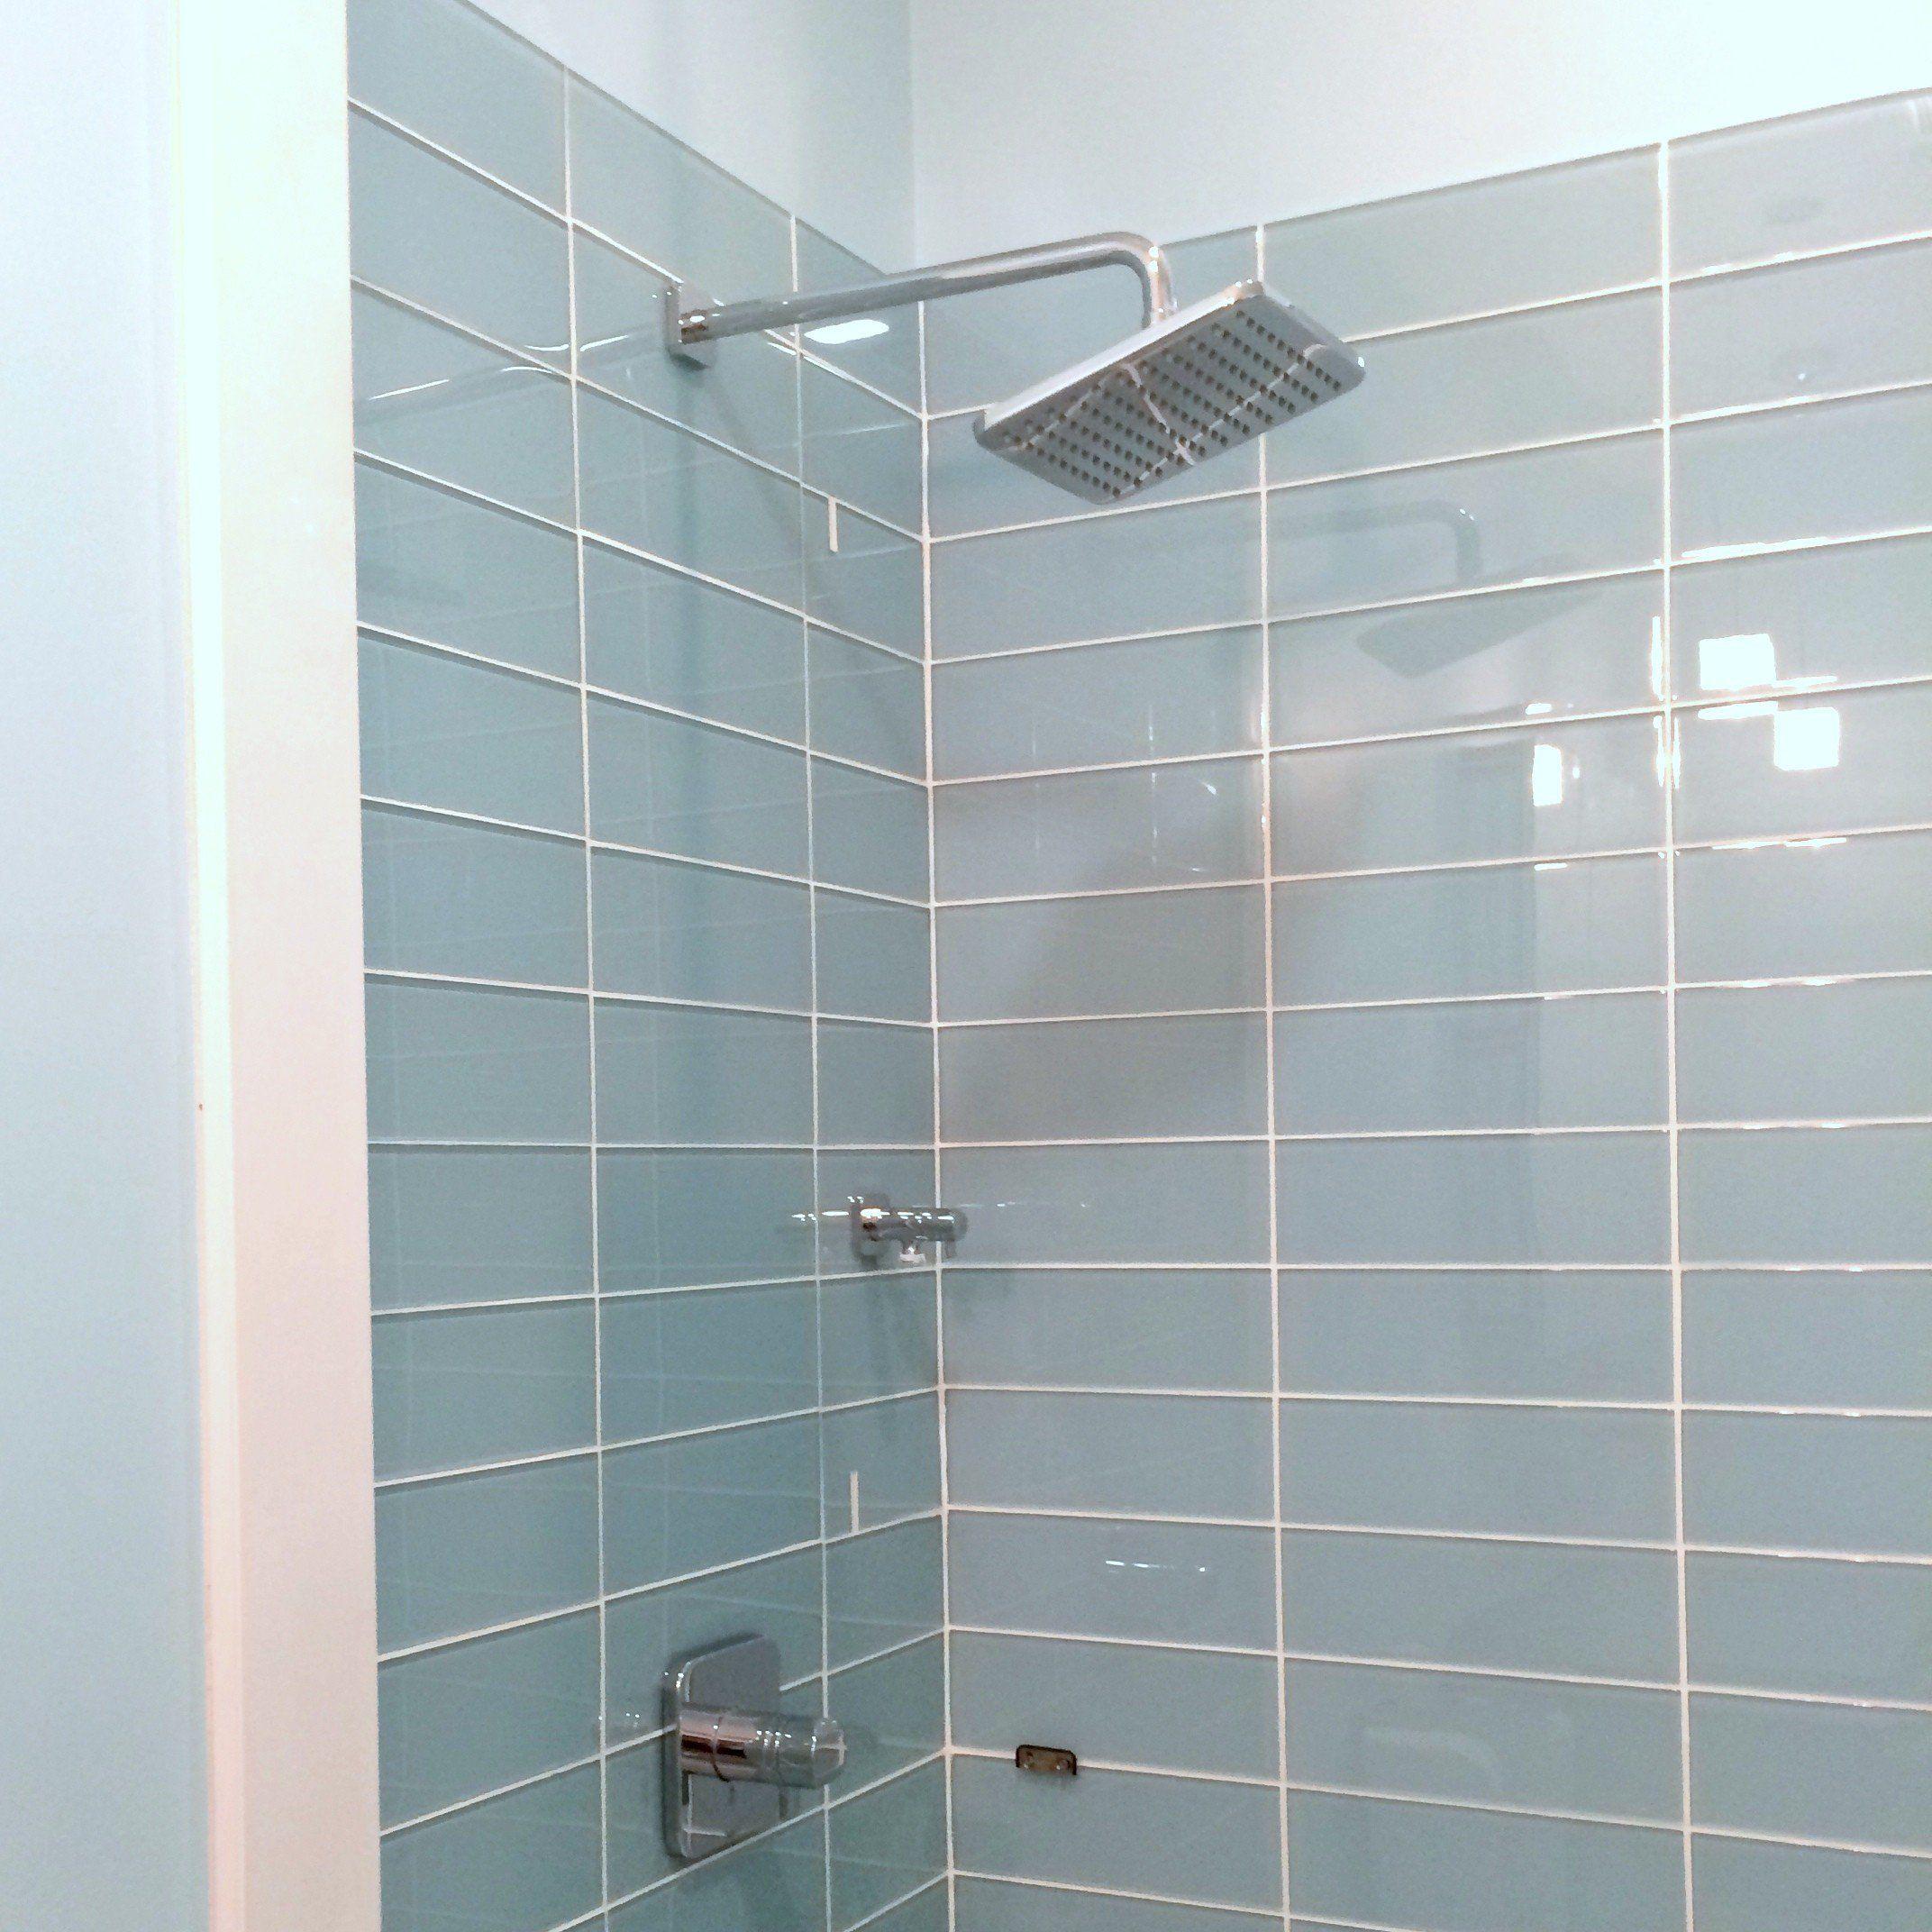 Bathroom Glass Subway Tile: Lush Vapor 4x12 Subway